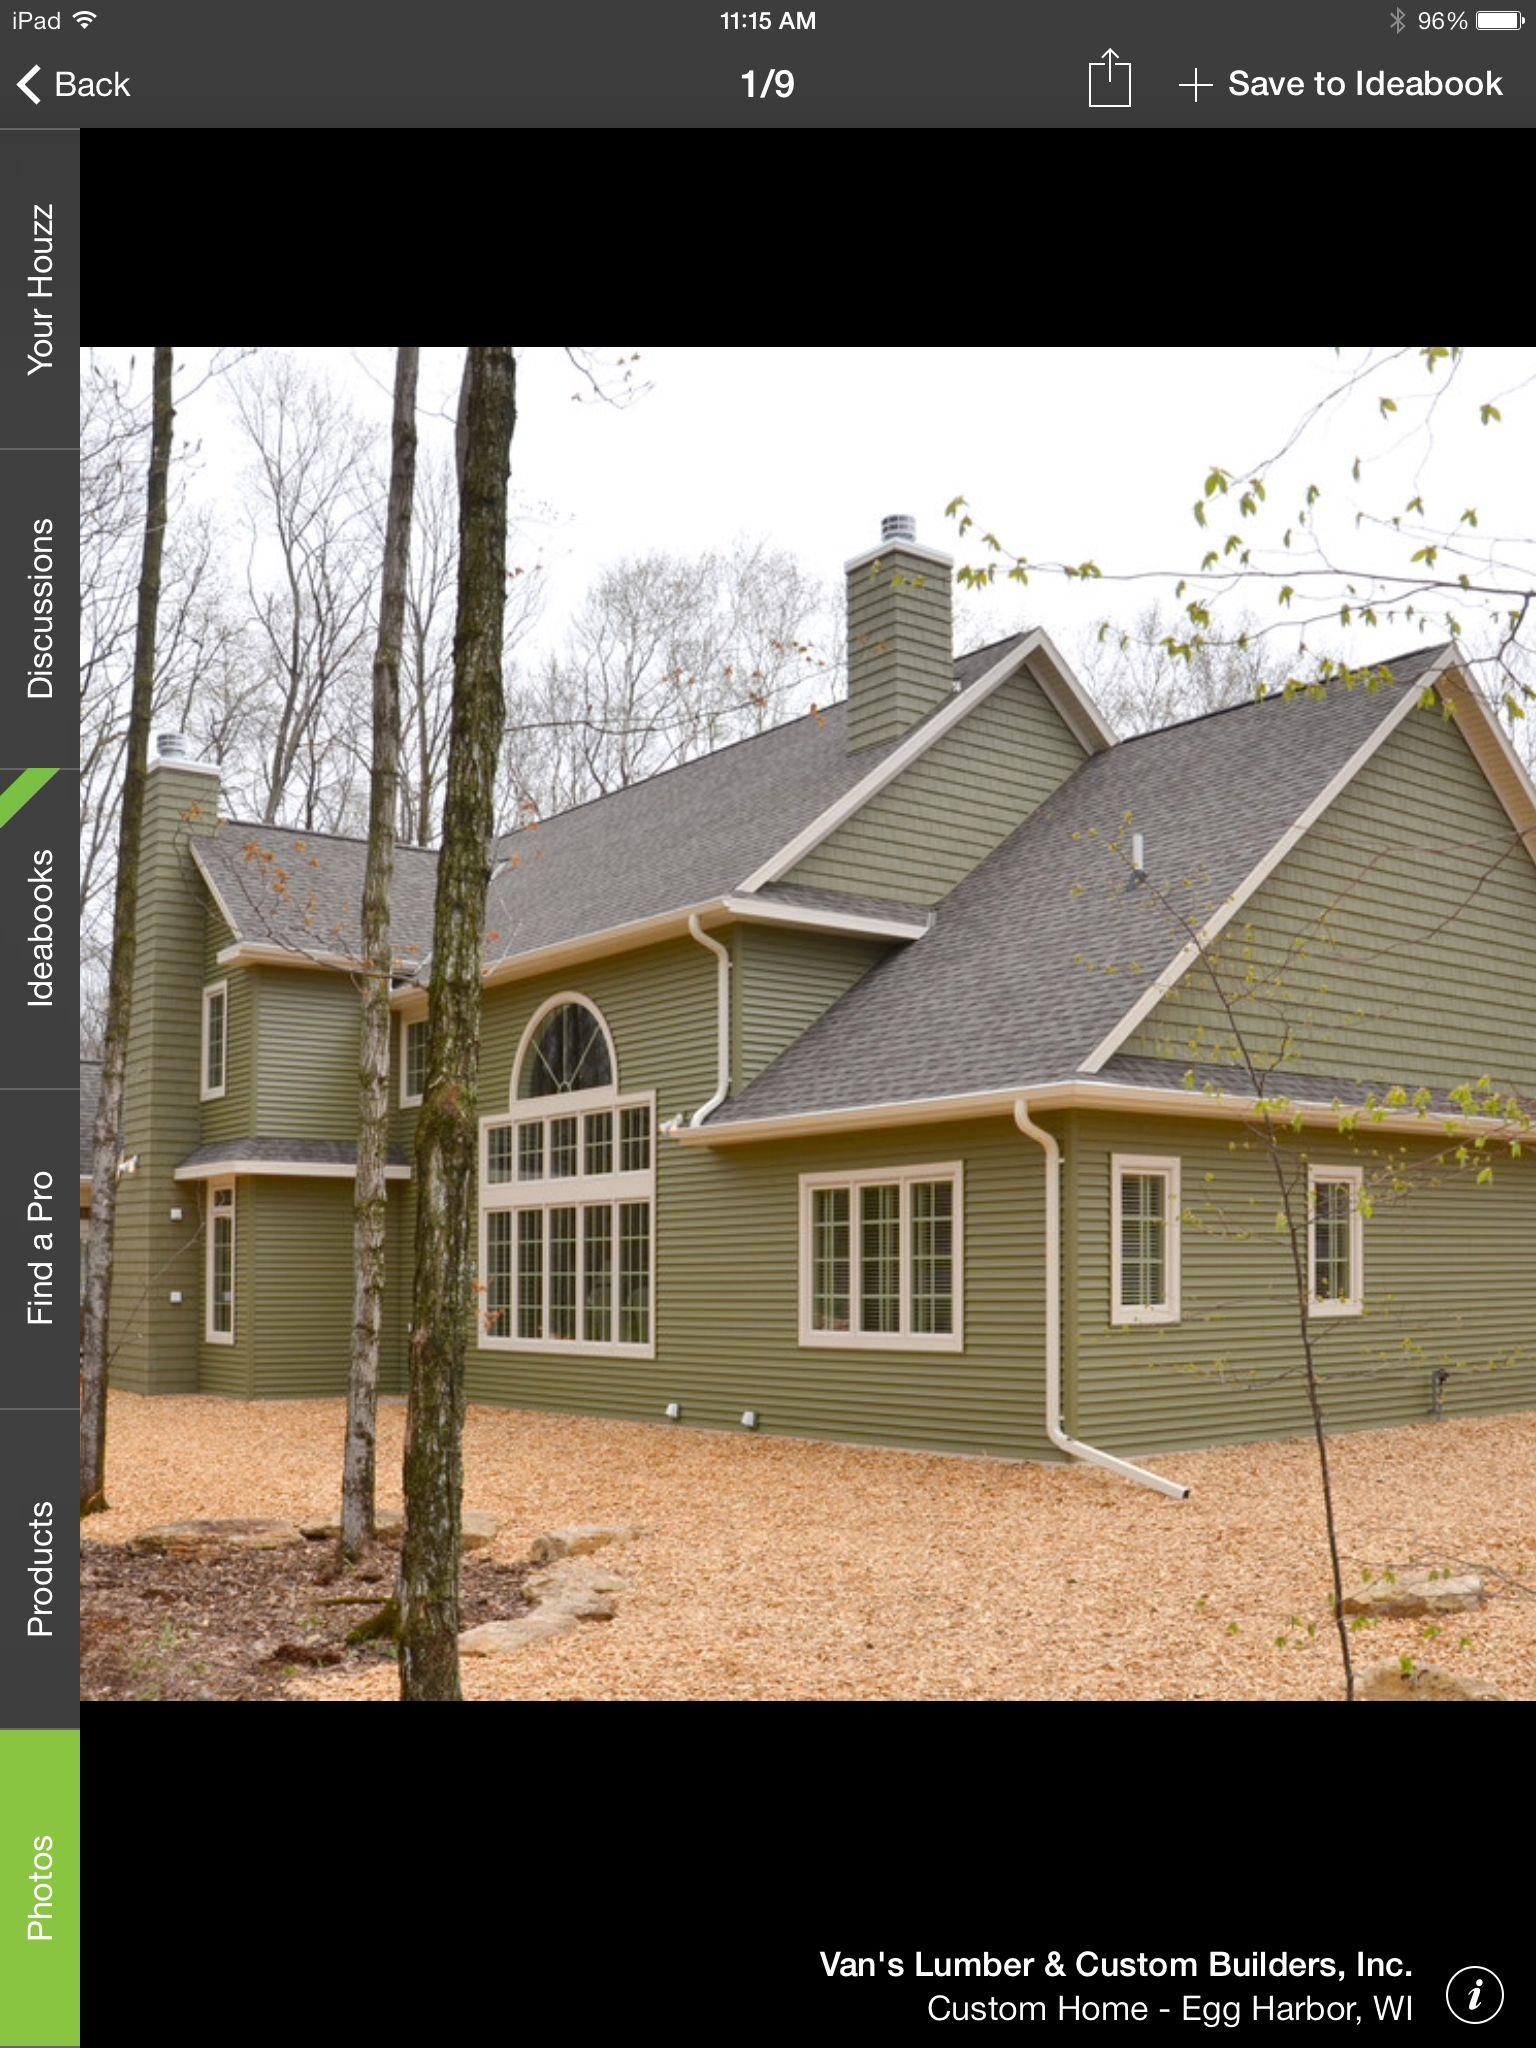 Spruce Green Siding Exterior House Colors House Exterior Vinyl Siding